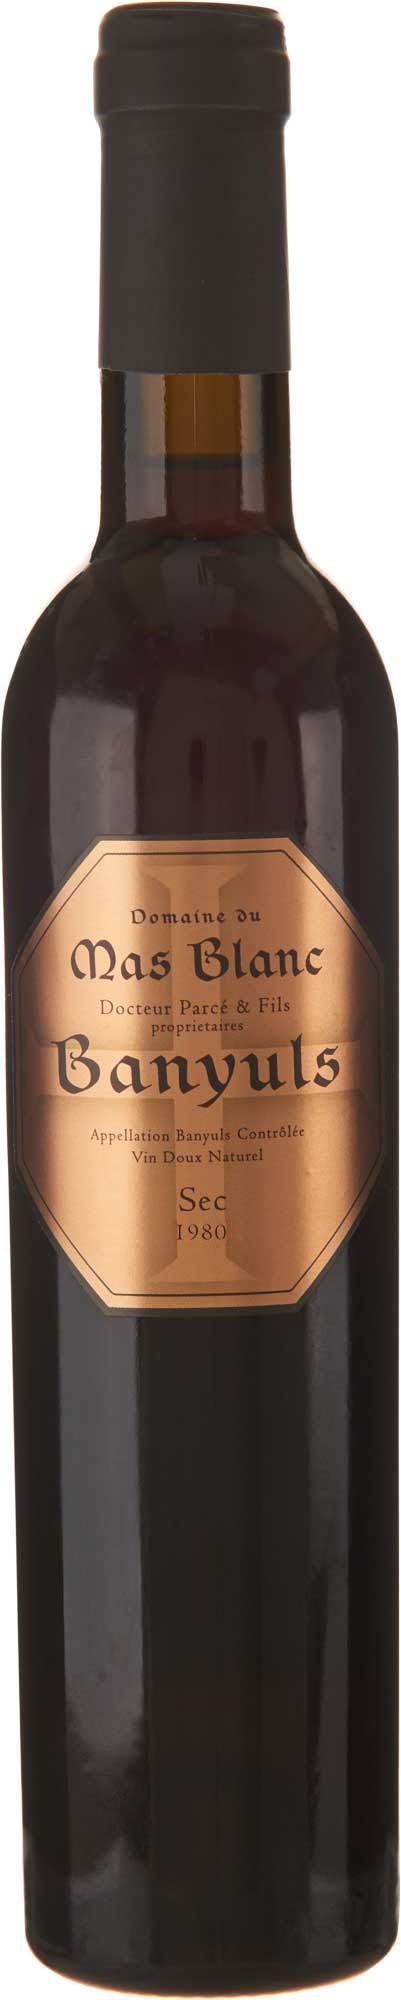 Domaine du Mas Blanc Banyuls Sec 1980